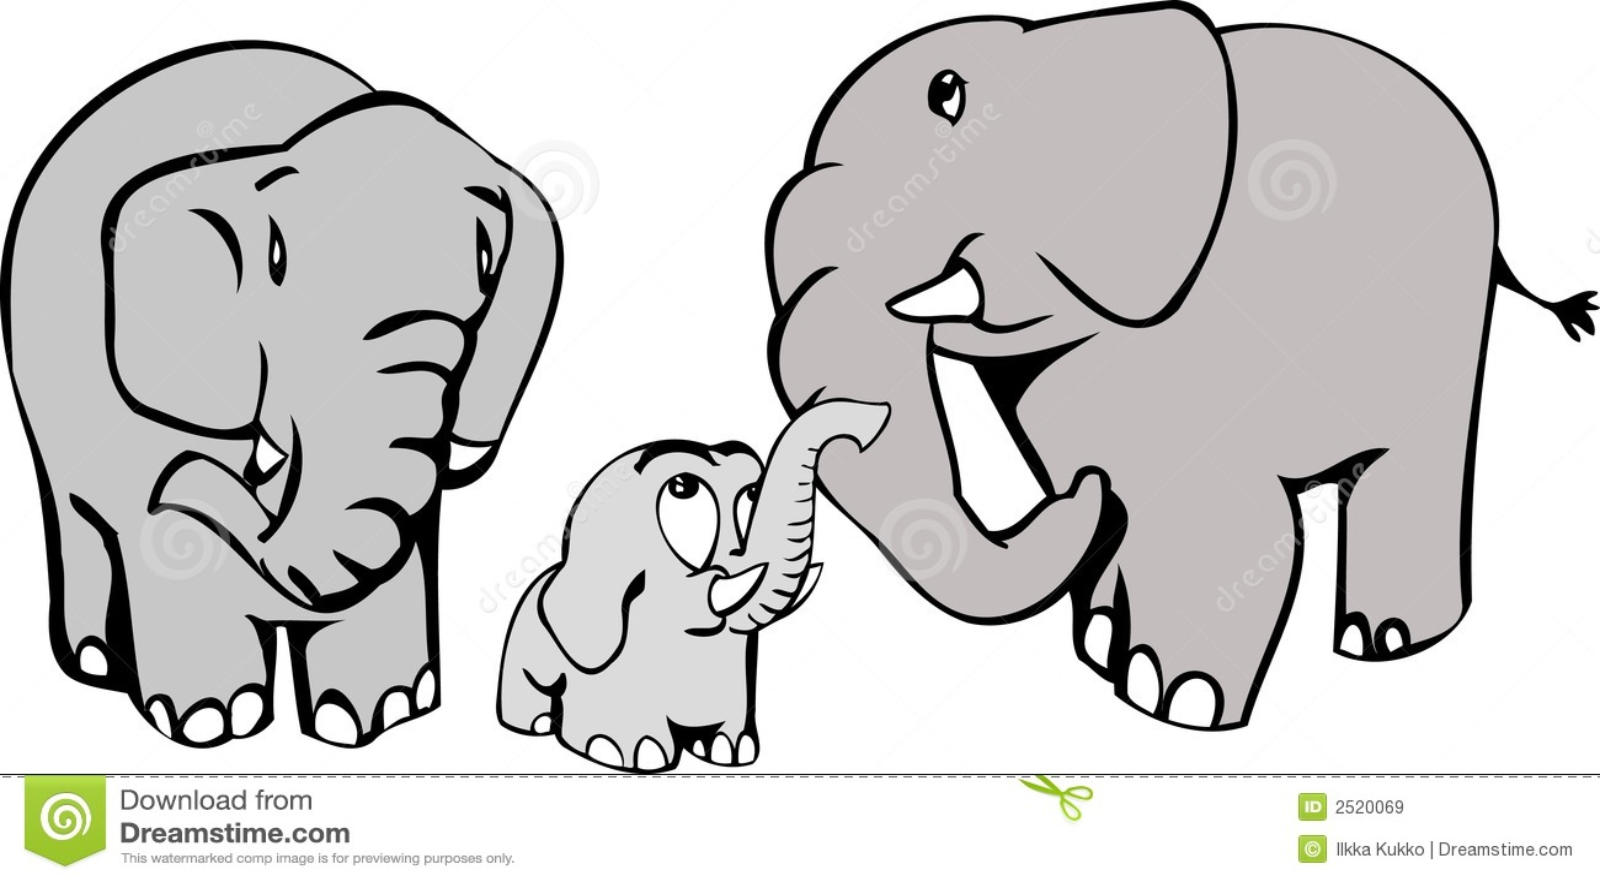 Watercolor Elephant Clipart #prints#ready#perfect#elements | Watercolor  elephant, Herd of elephants, Clip art